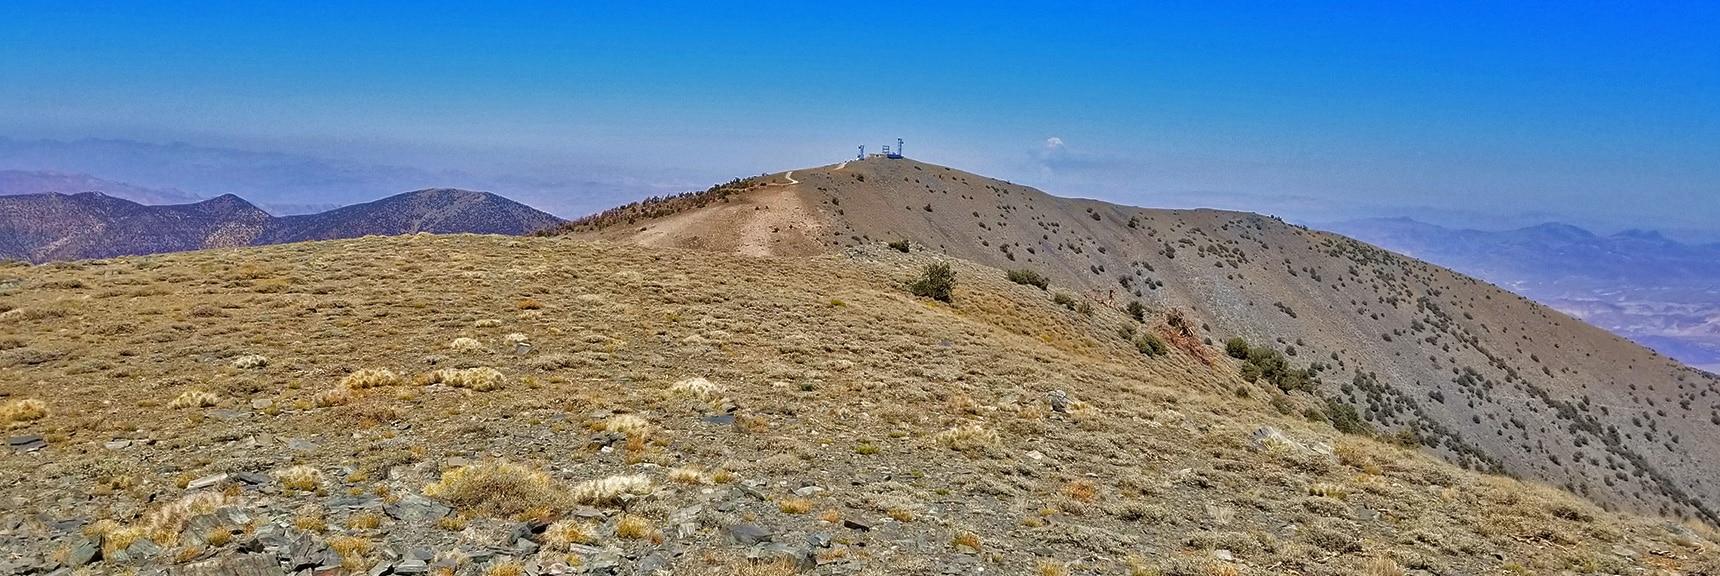 Rogers Peak Viewed from Bennett Peak Summit   Telescope Peak Summit from Wildrose Charcoal Kilns Parking Area, Panamint Mountains, Death Valley National Park, California